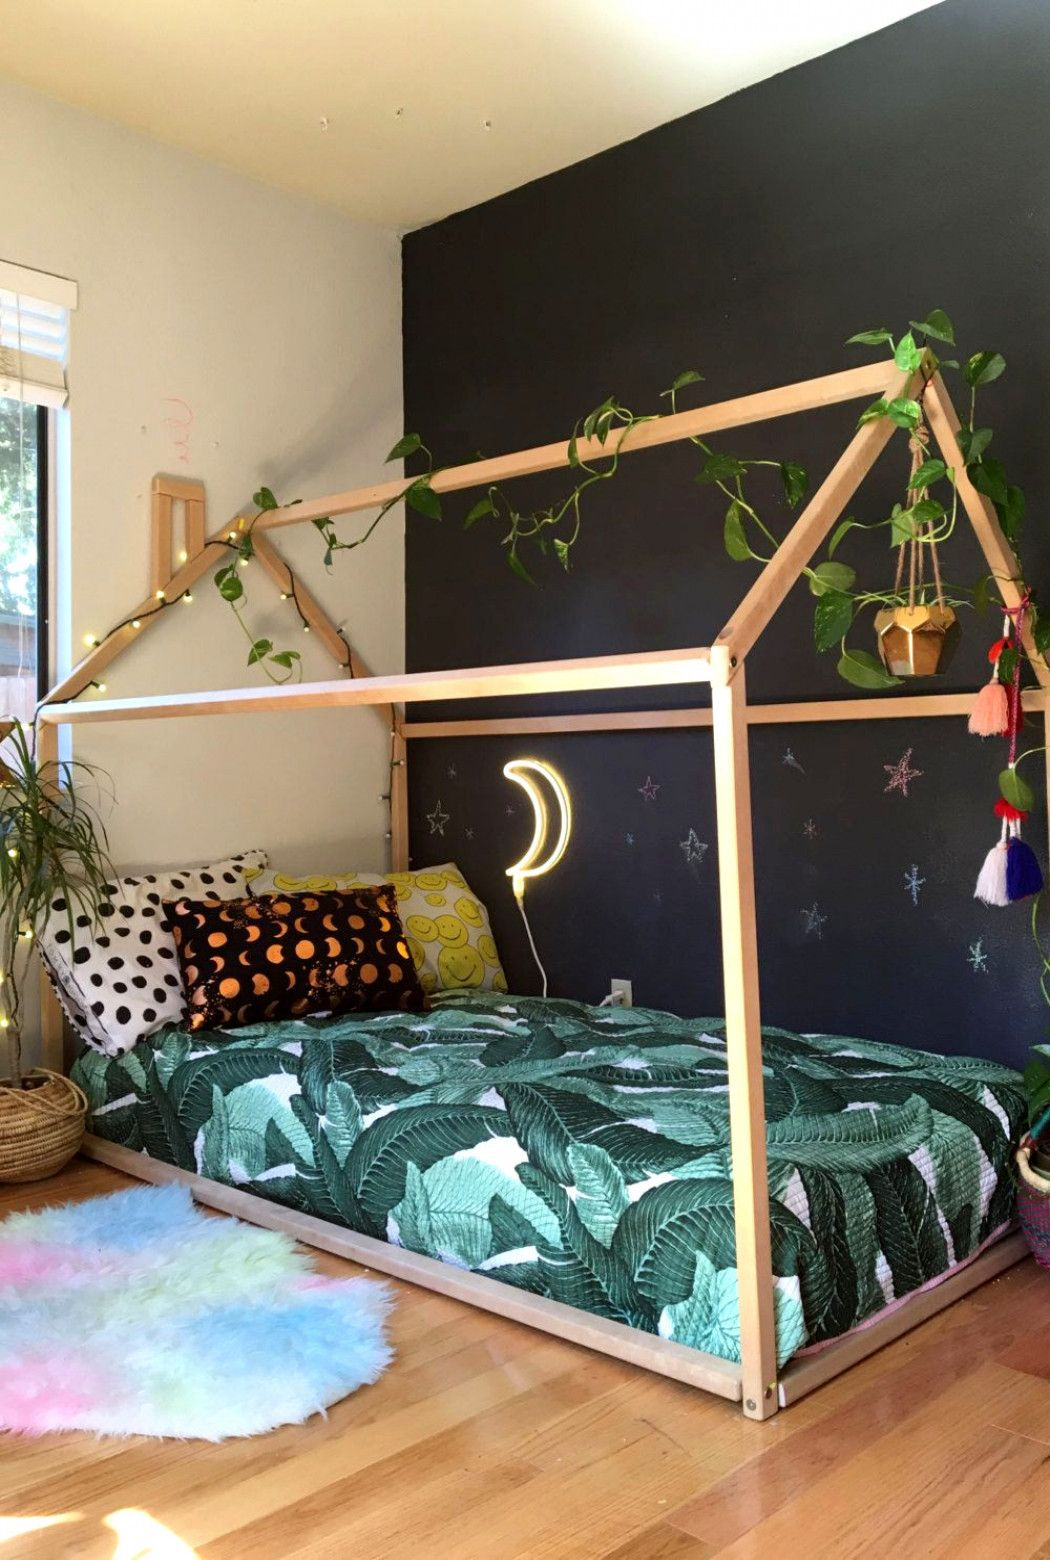 kids bedroom decor that inspires imagination kidsfurniture willow rh pinterest com